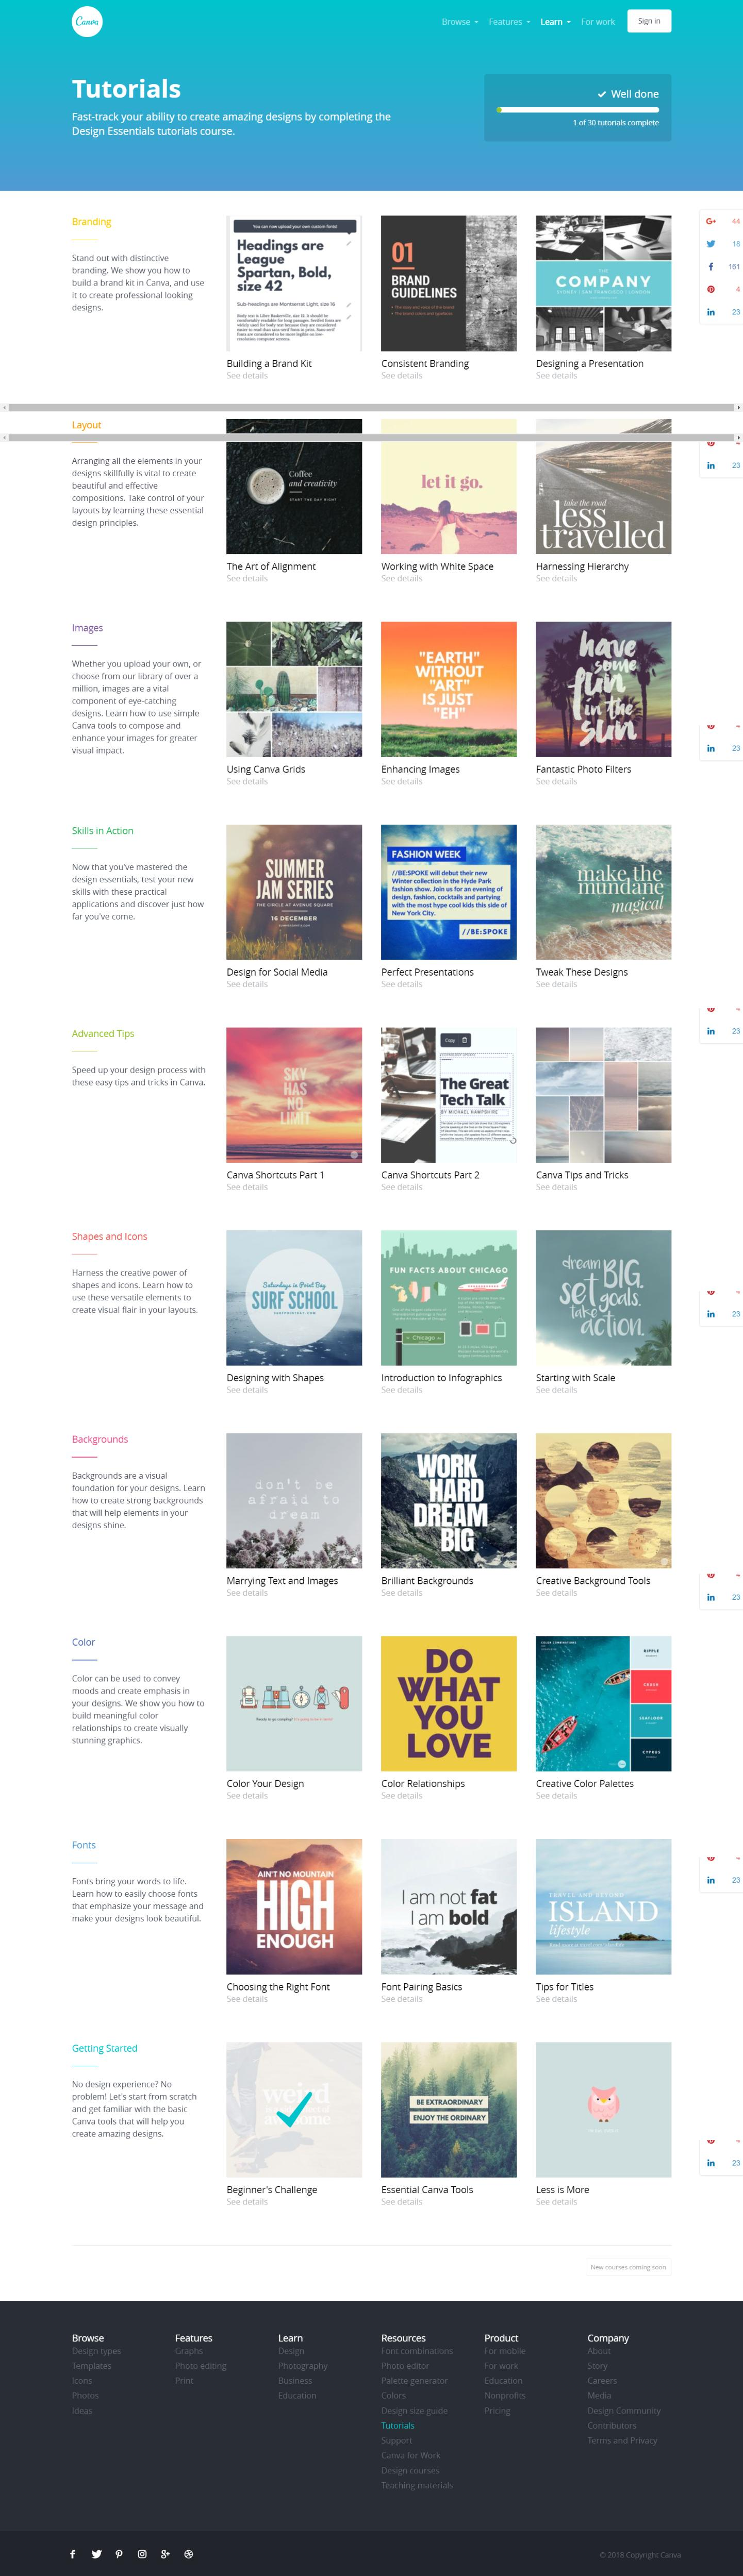 Graphic Design Tutorials By Canva